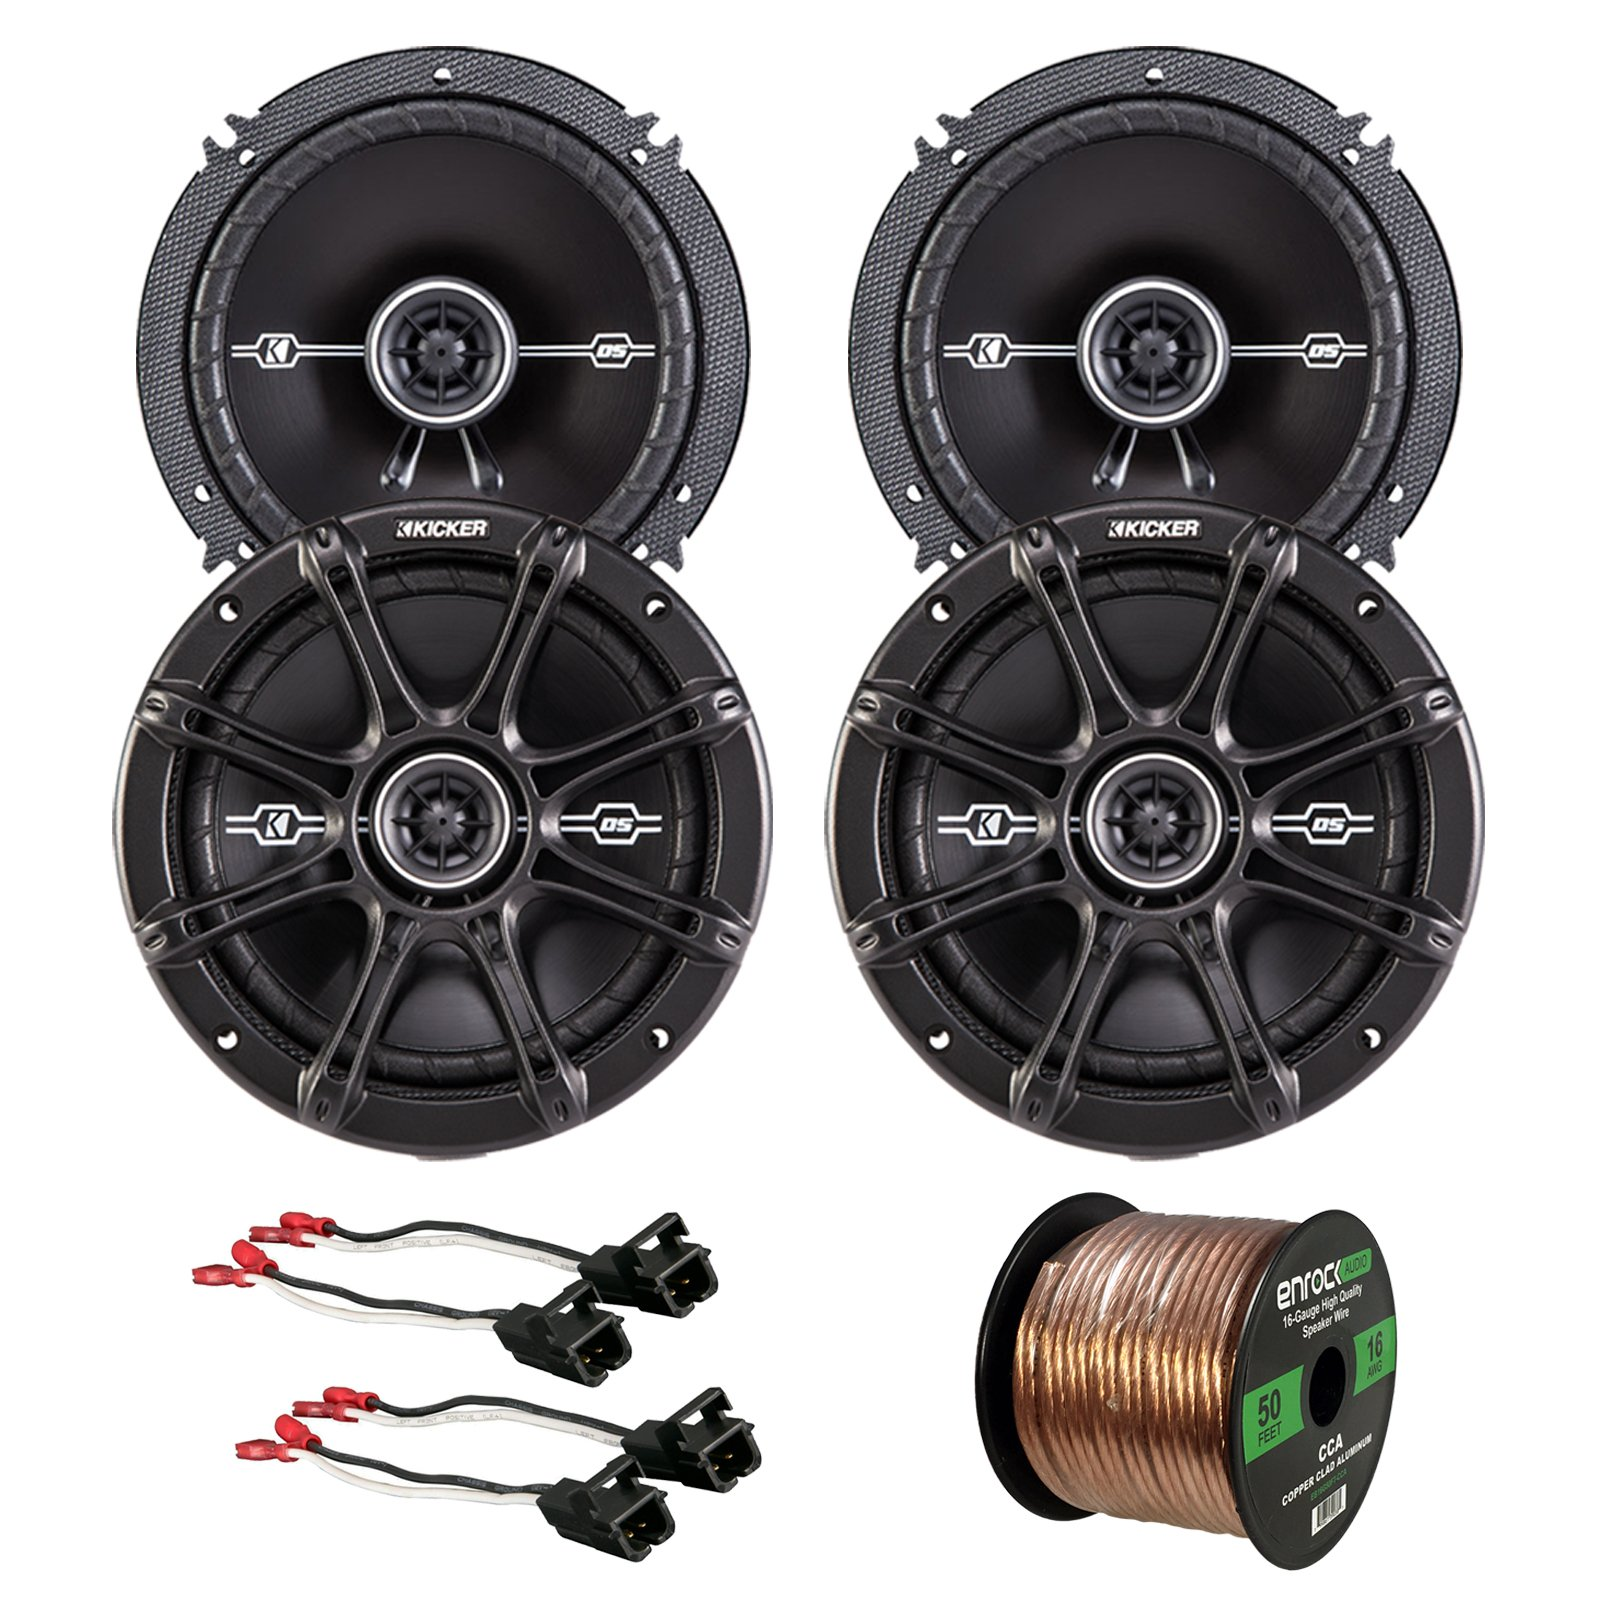 Car Speaker Bundle Combo: 2 Pairs of Kicker 43DSC6504 6.5'' Inch 480 Watts 2-Way D-Series Black Car Stereo Coaxial Speaker + Metra Speaker Wiring Harness + Enrock 50 Foot 16 Gauge Speaker Wire by EnrockAudioBundle